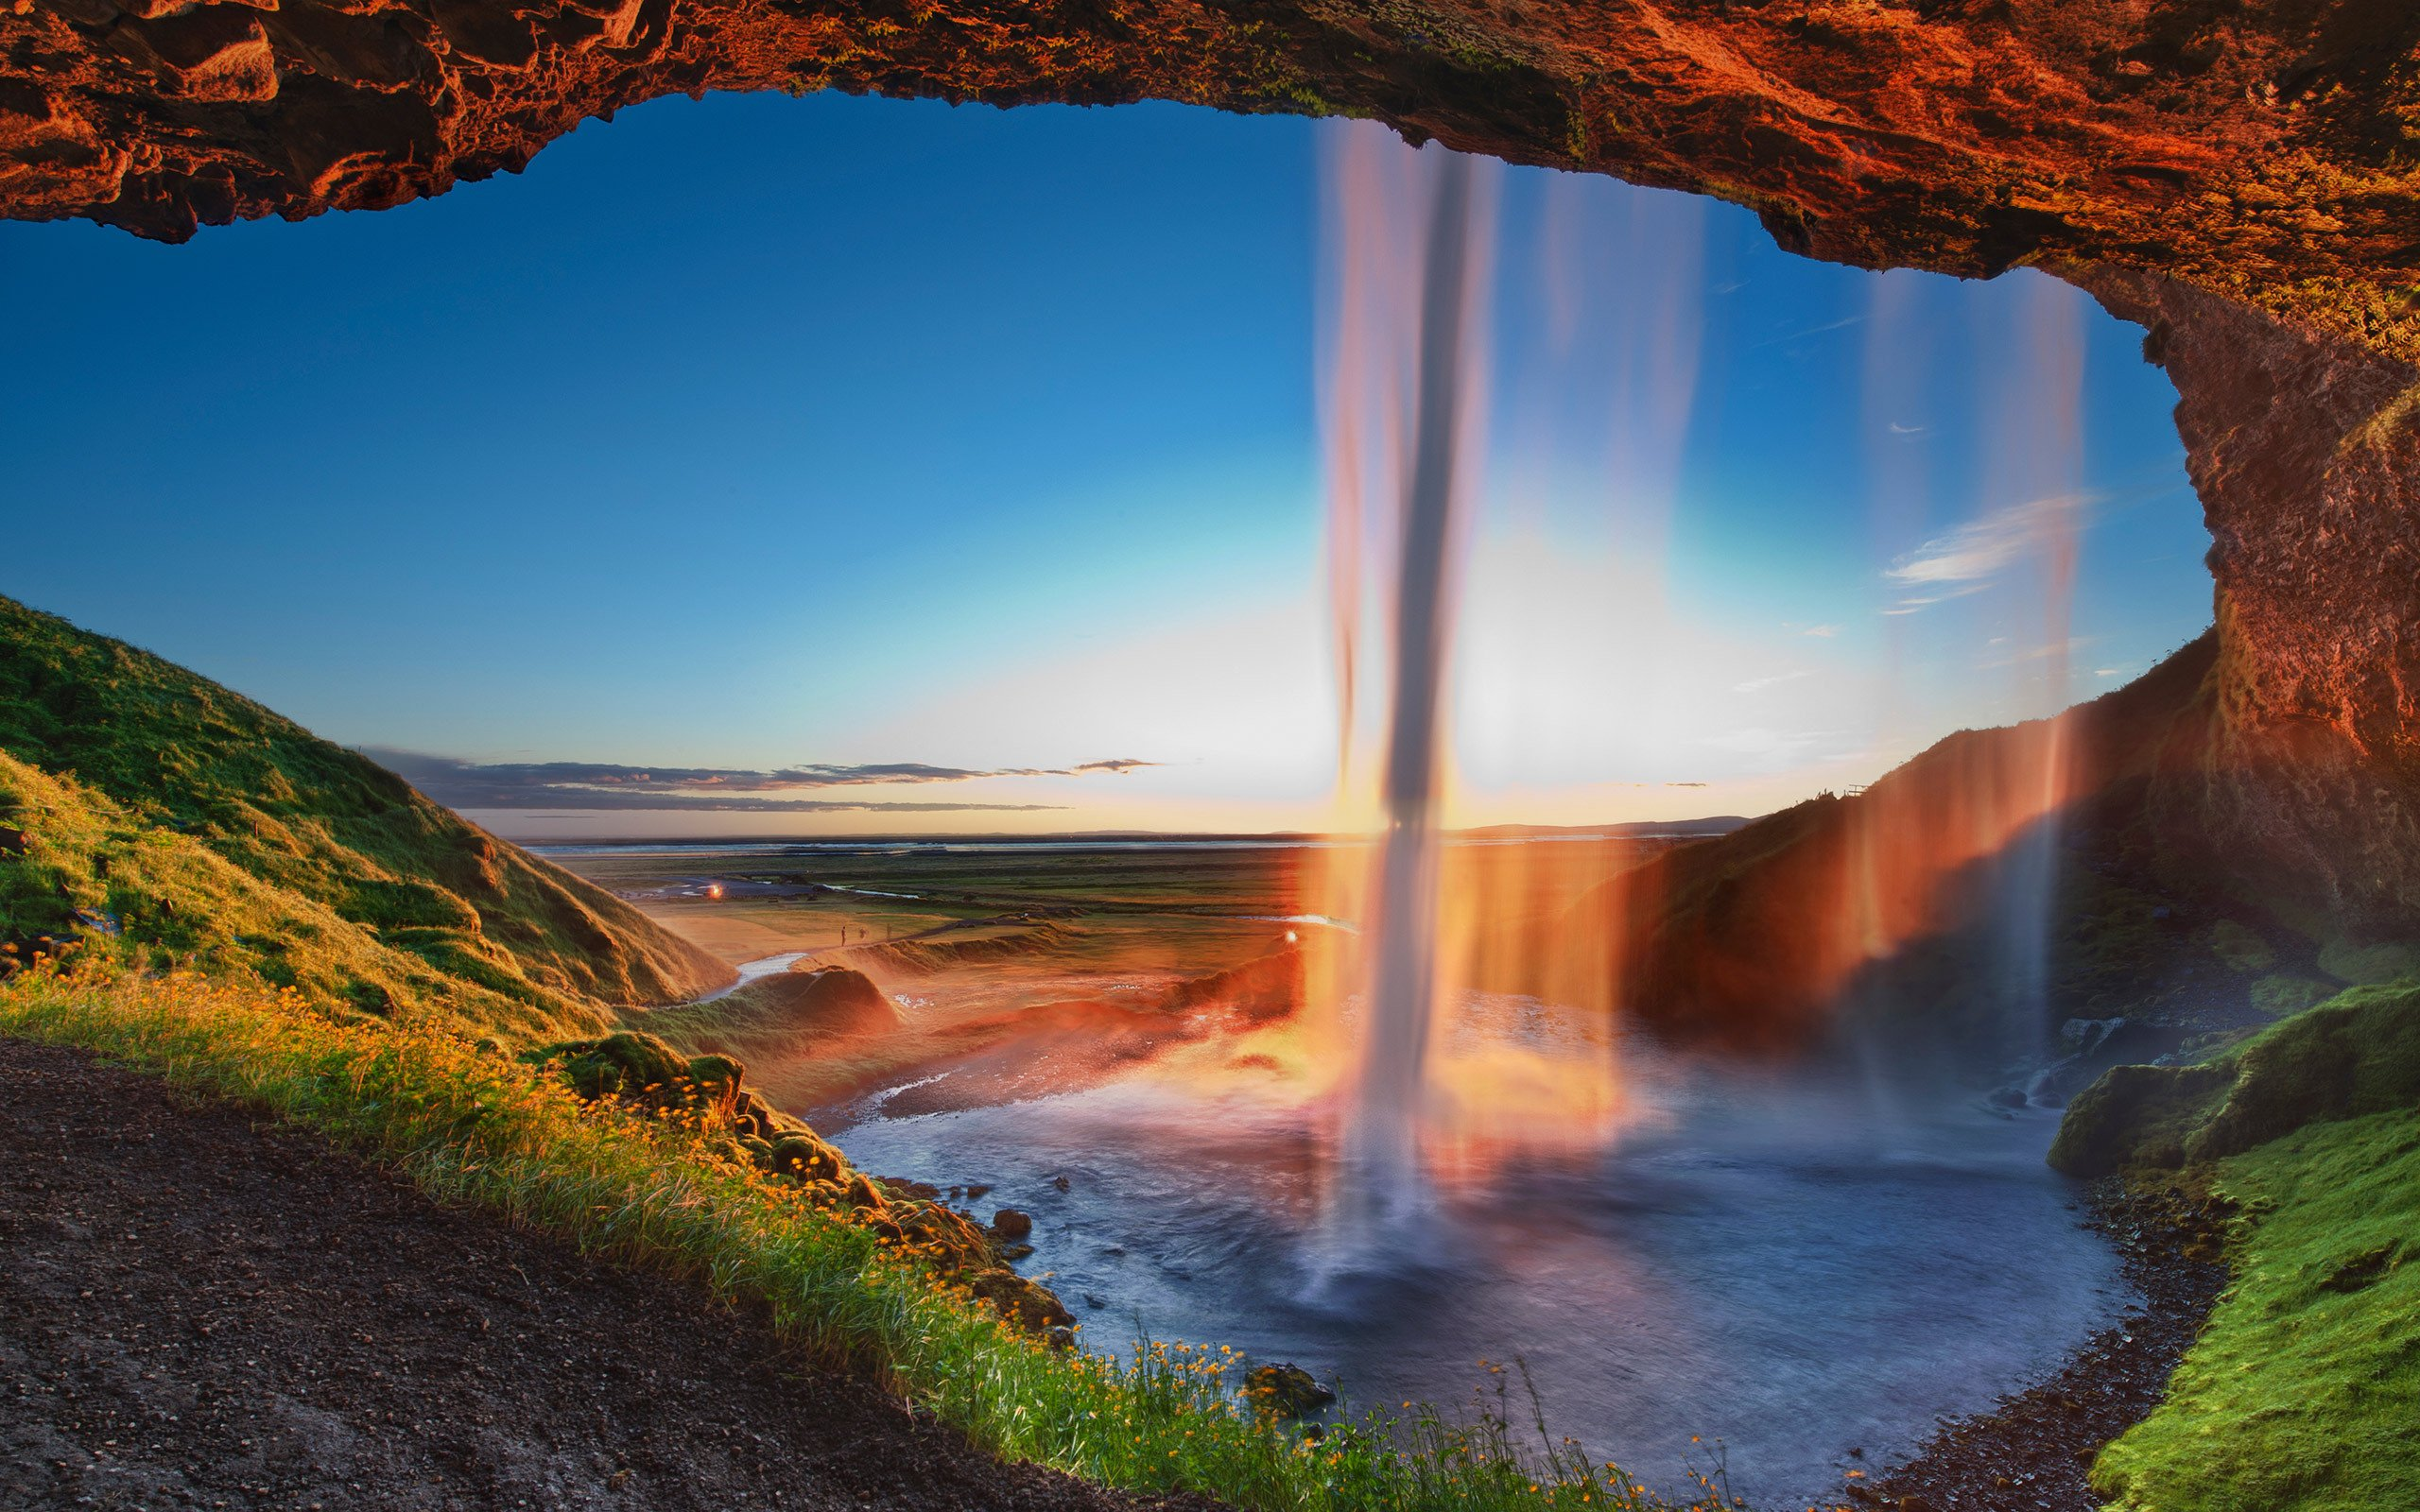 Waterfall Iceland Seljalandsfoss wallpaper 2560x1600 282516 2560x1600